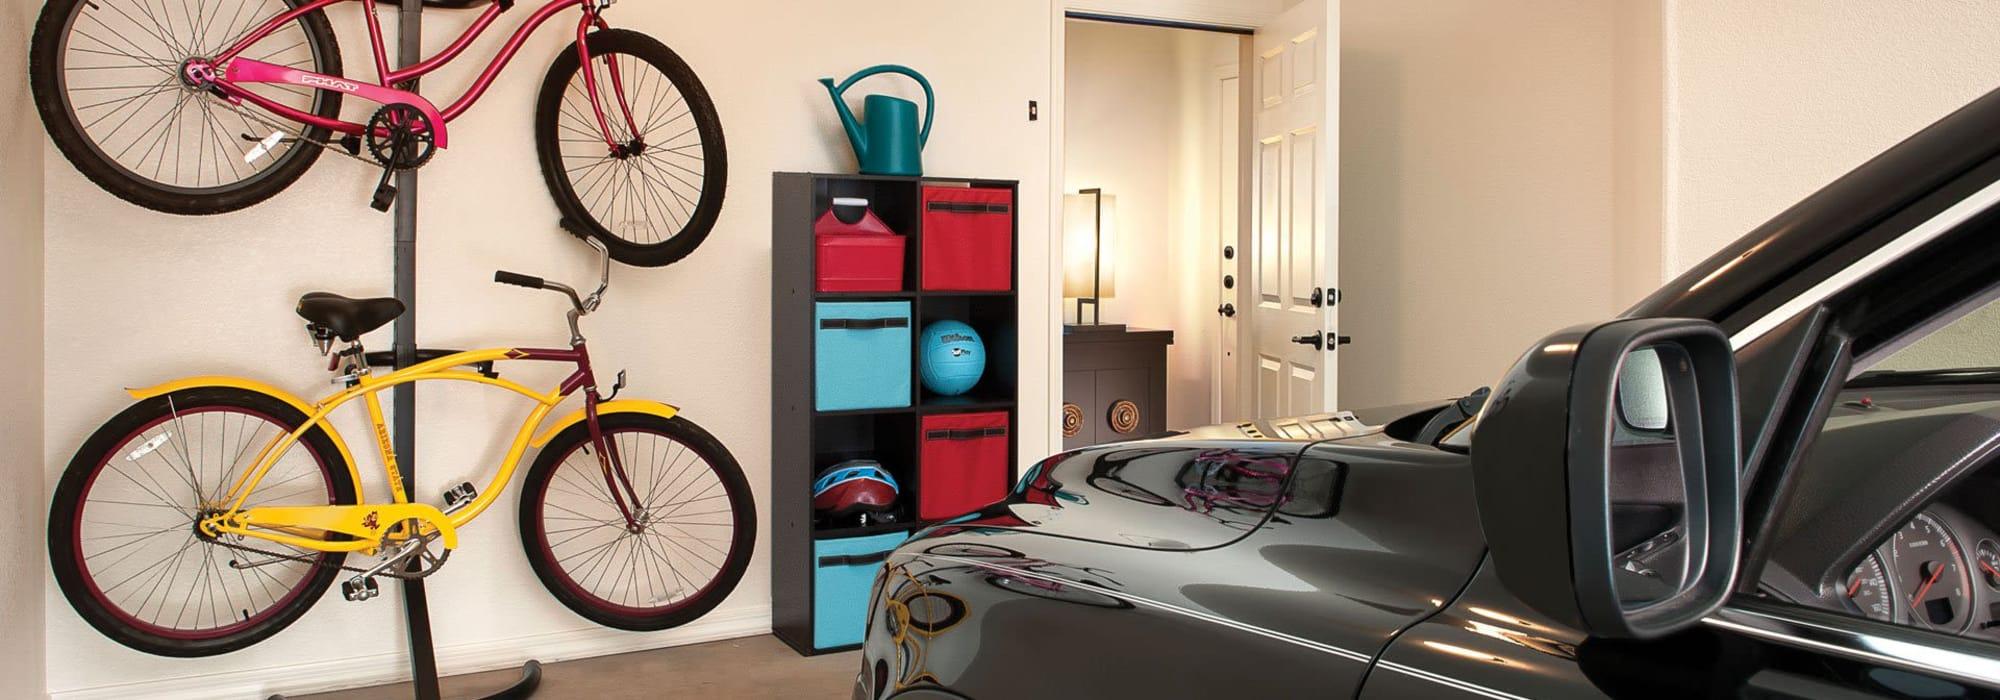 Private garage for apartment home at San Milan in Phoenix, Arizona